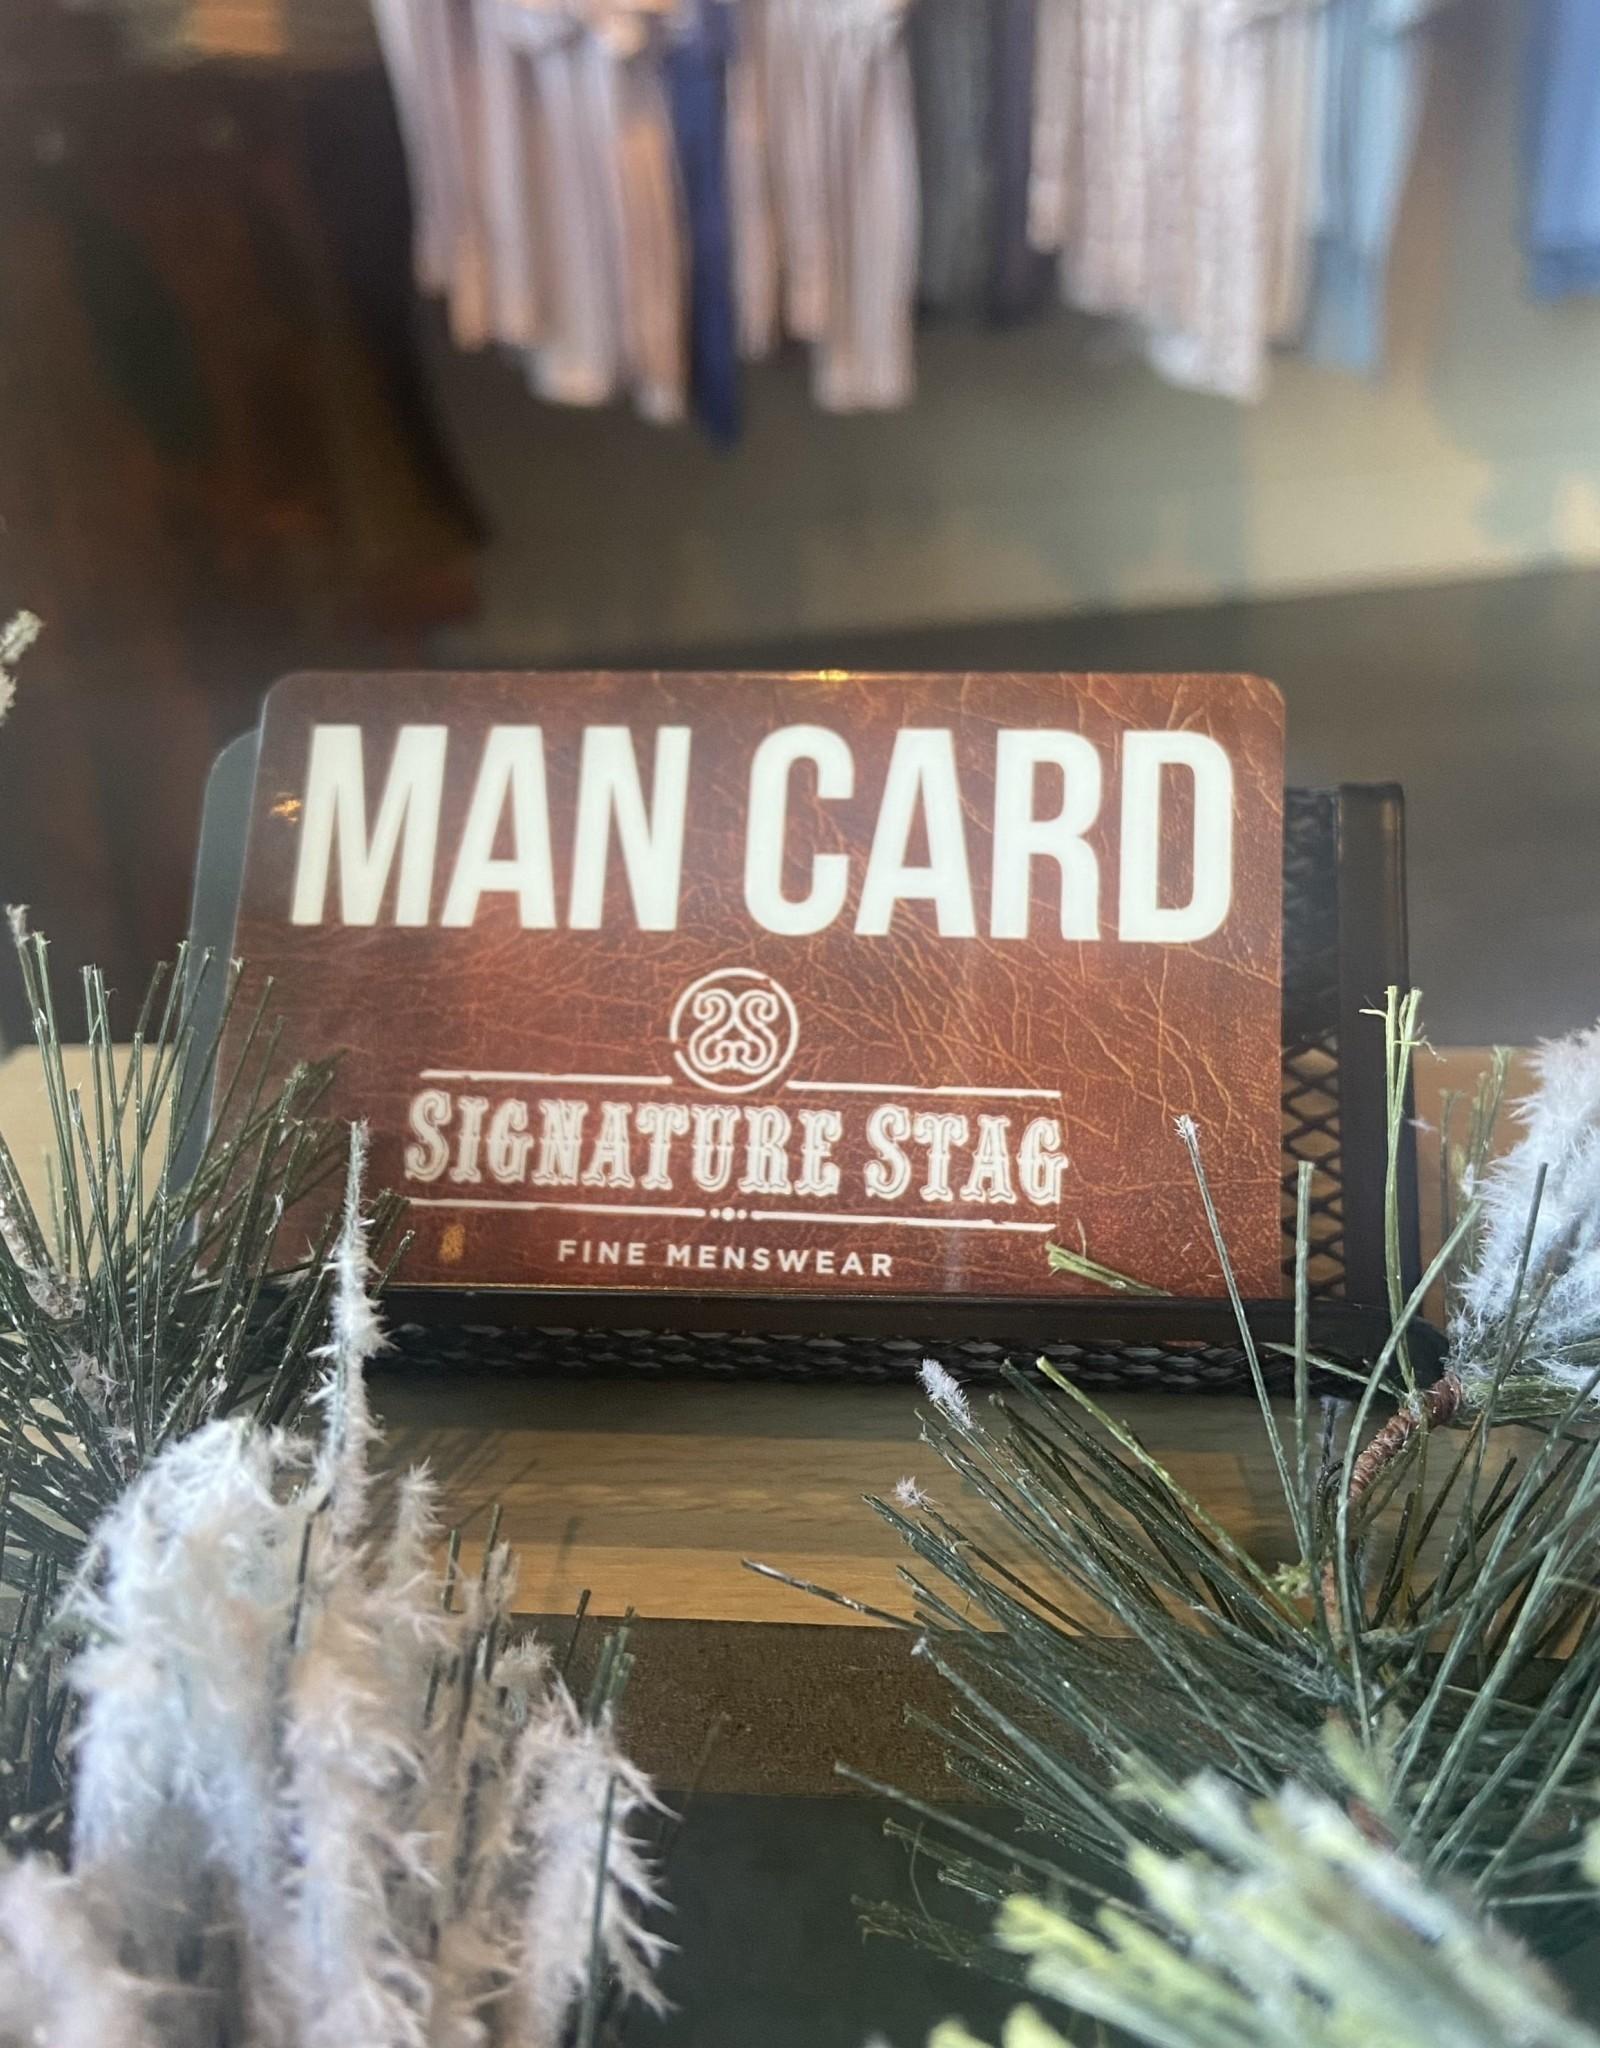 $50 Man Card with bonus $5 Stag Cash